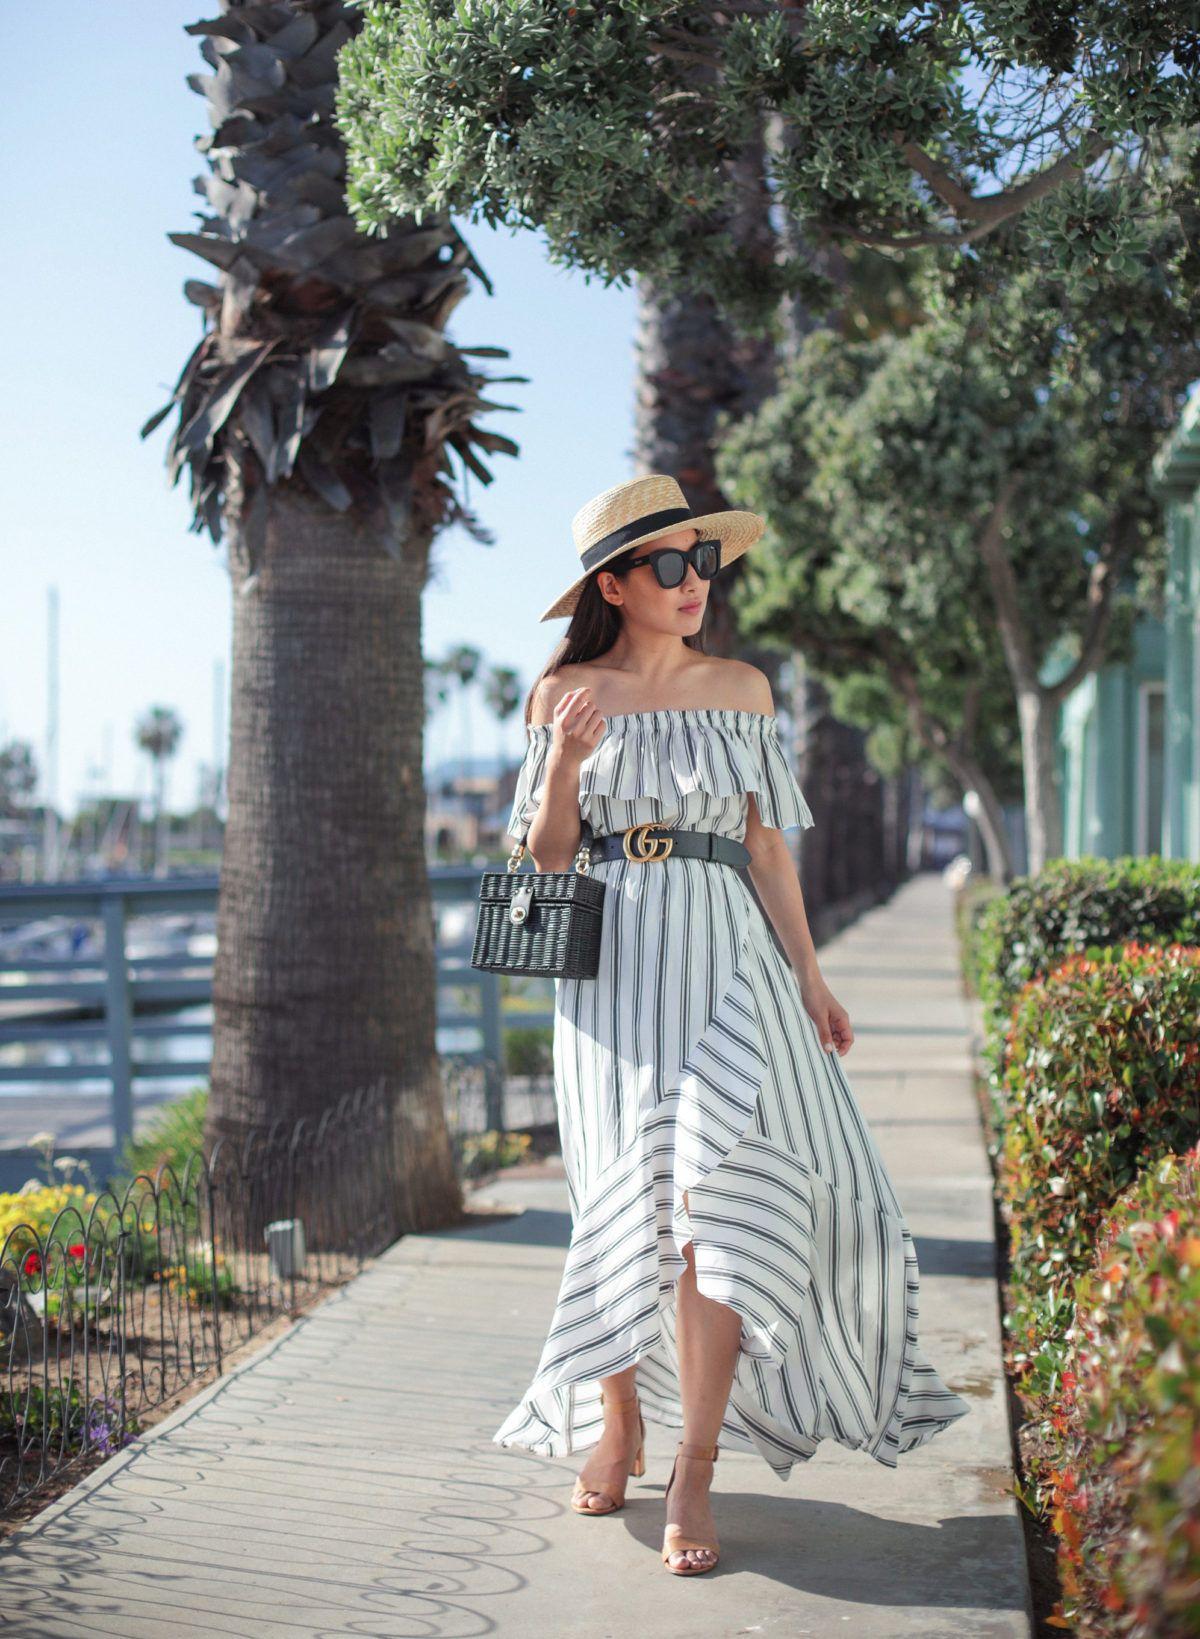 Striped Nursing Friendly Outfit Maxi Dress For Petites Petite Maxi Dress Striped Maxi Dresses Maxi Dress [ 1639 x 1200 Pixel ]